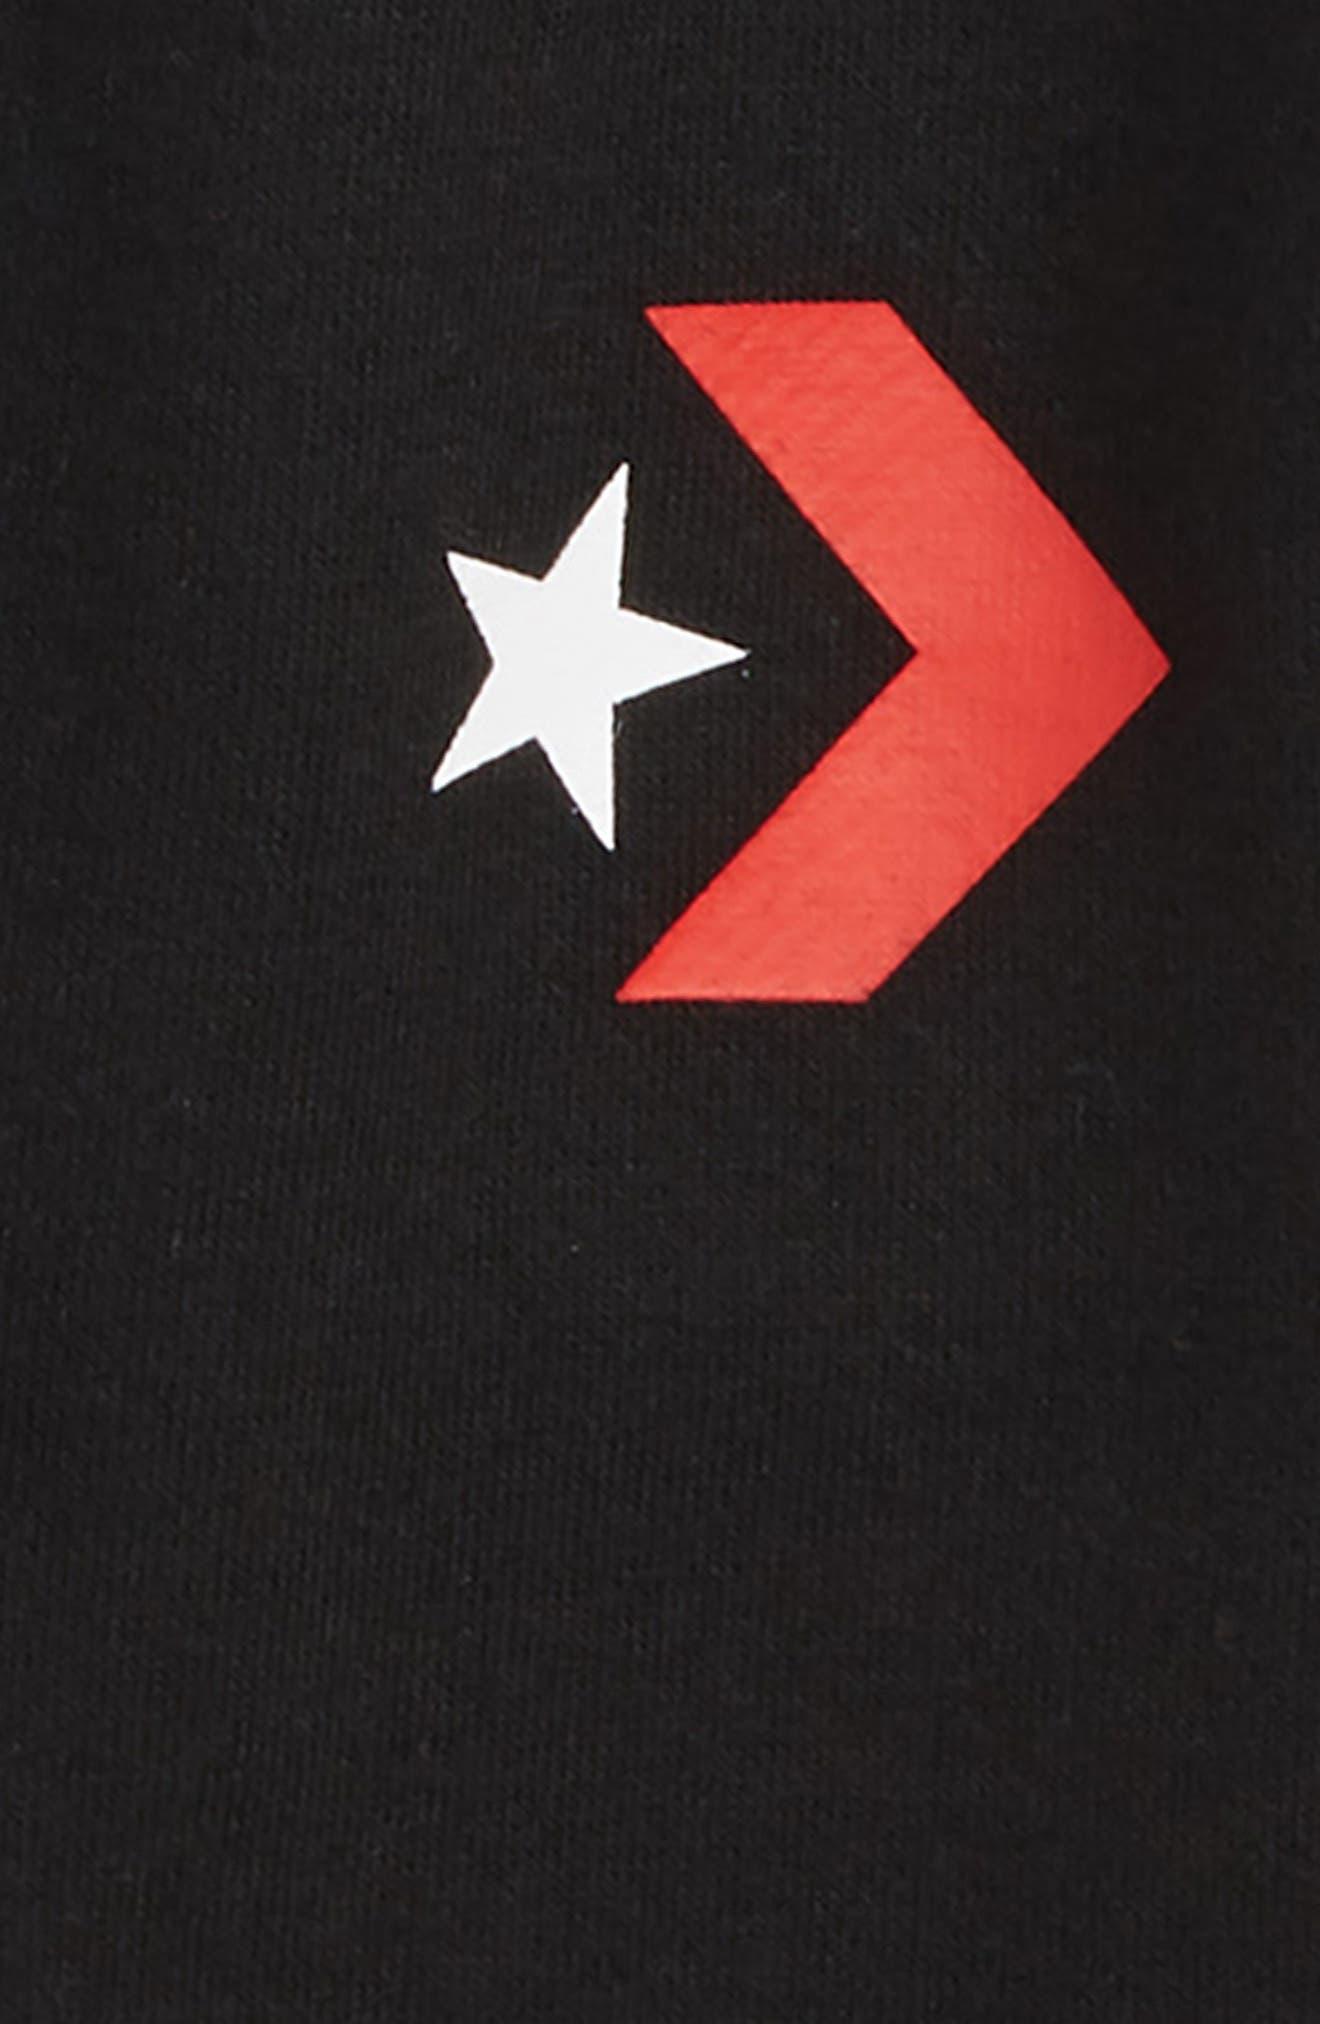 Star Chevron Graphic Shorts,                             Alternate thumbnail 2, color,                             001